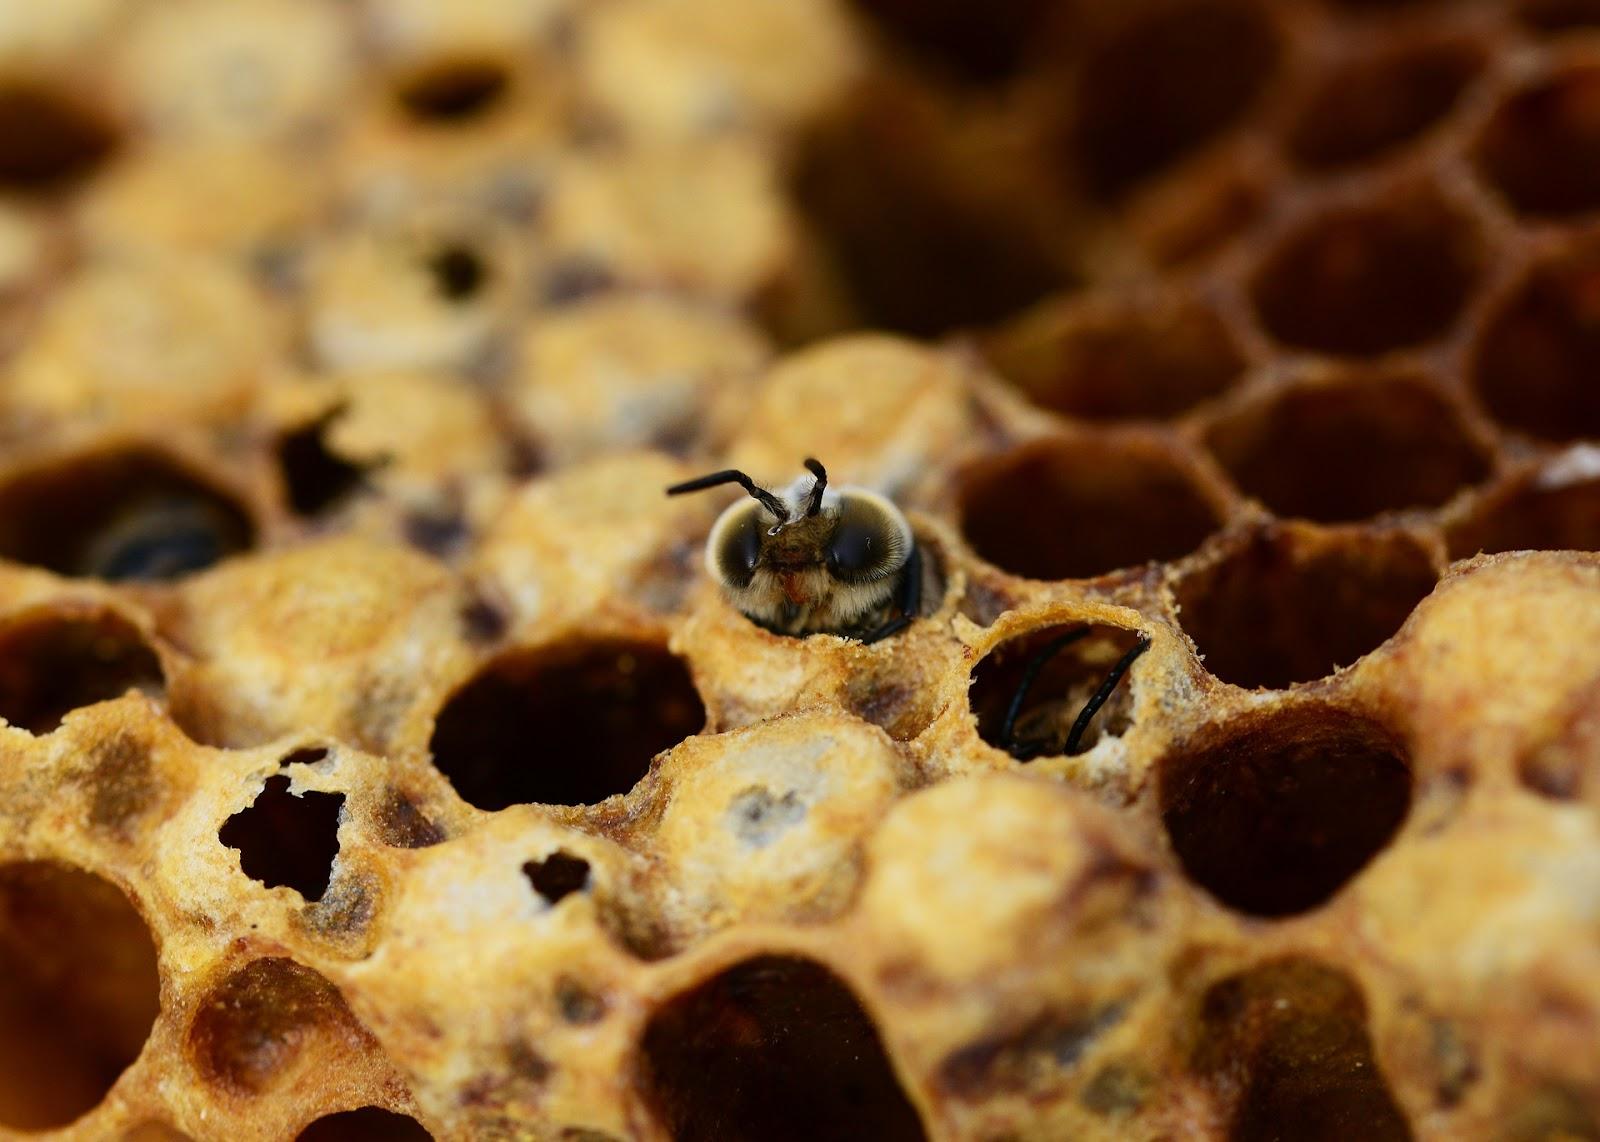 Honeybee drone in hive